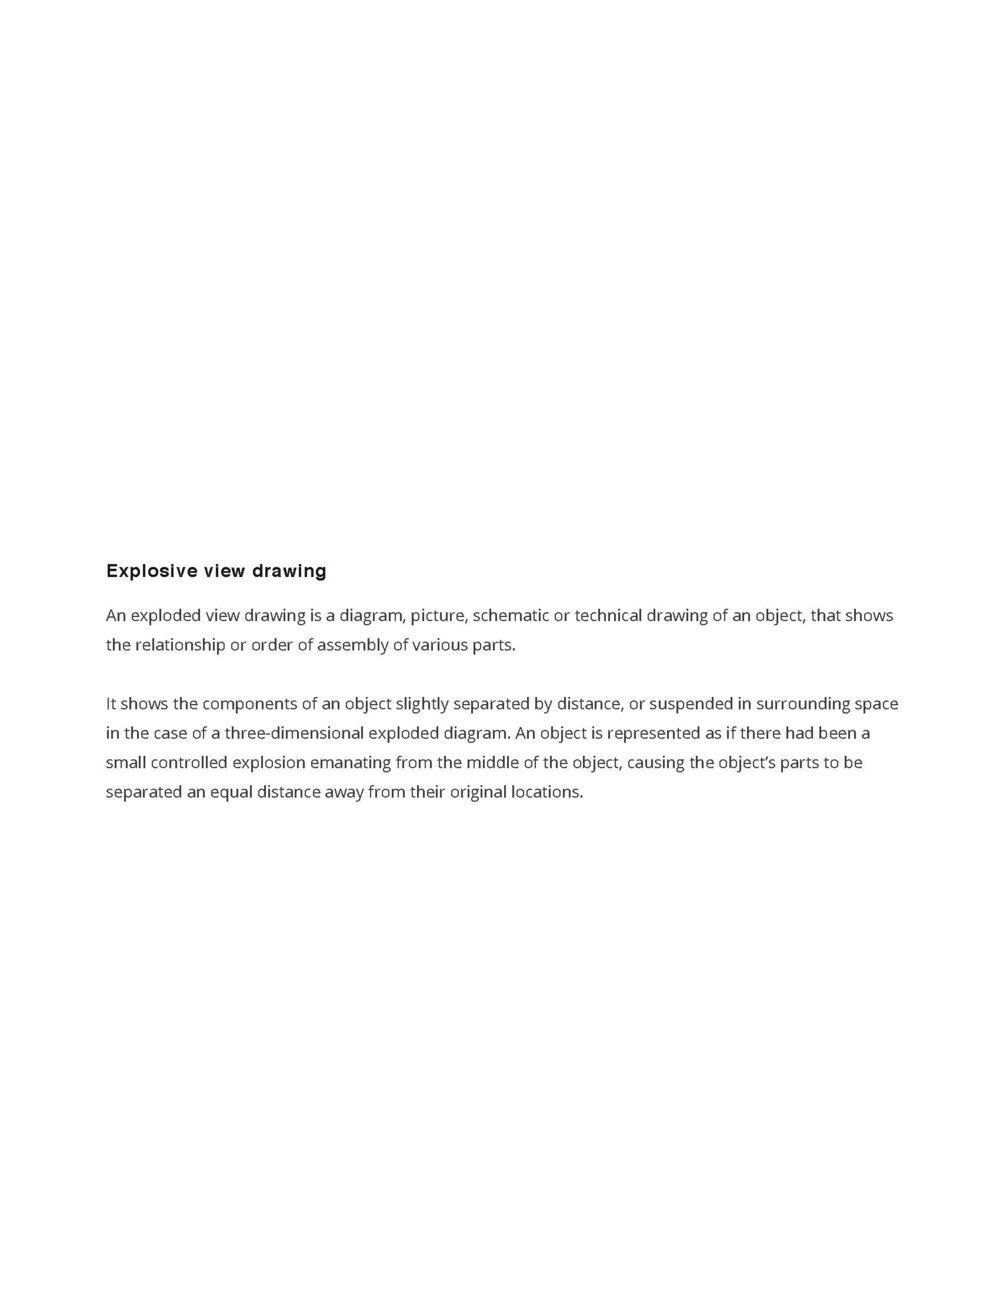 narrative book_Page_25.jpg